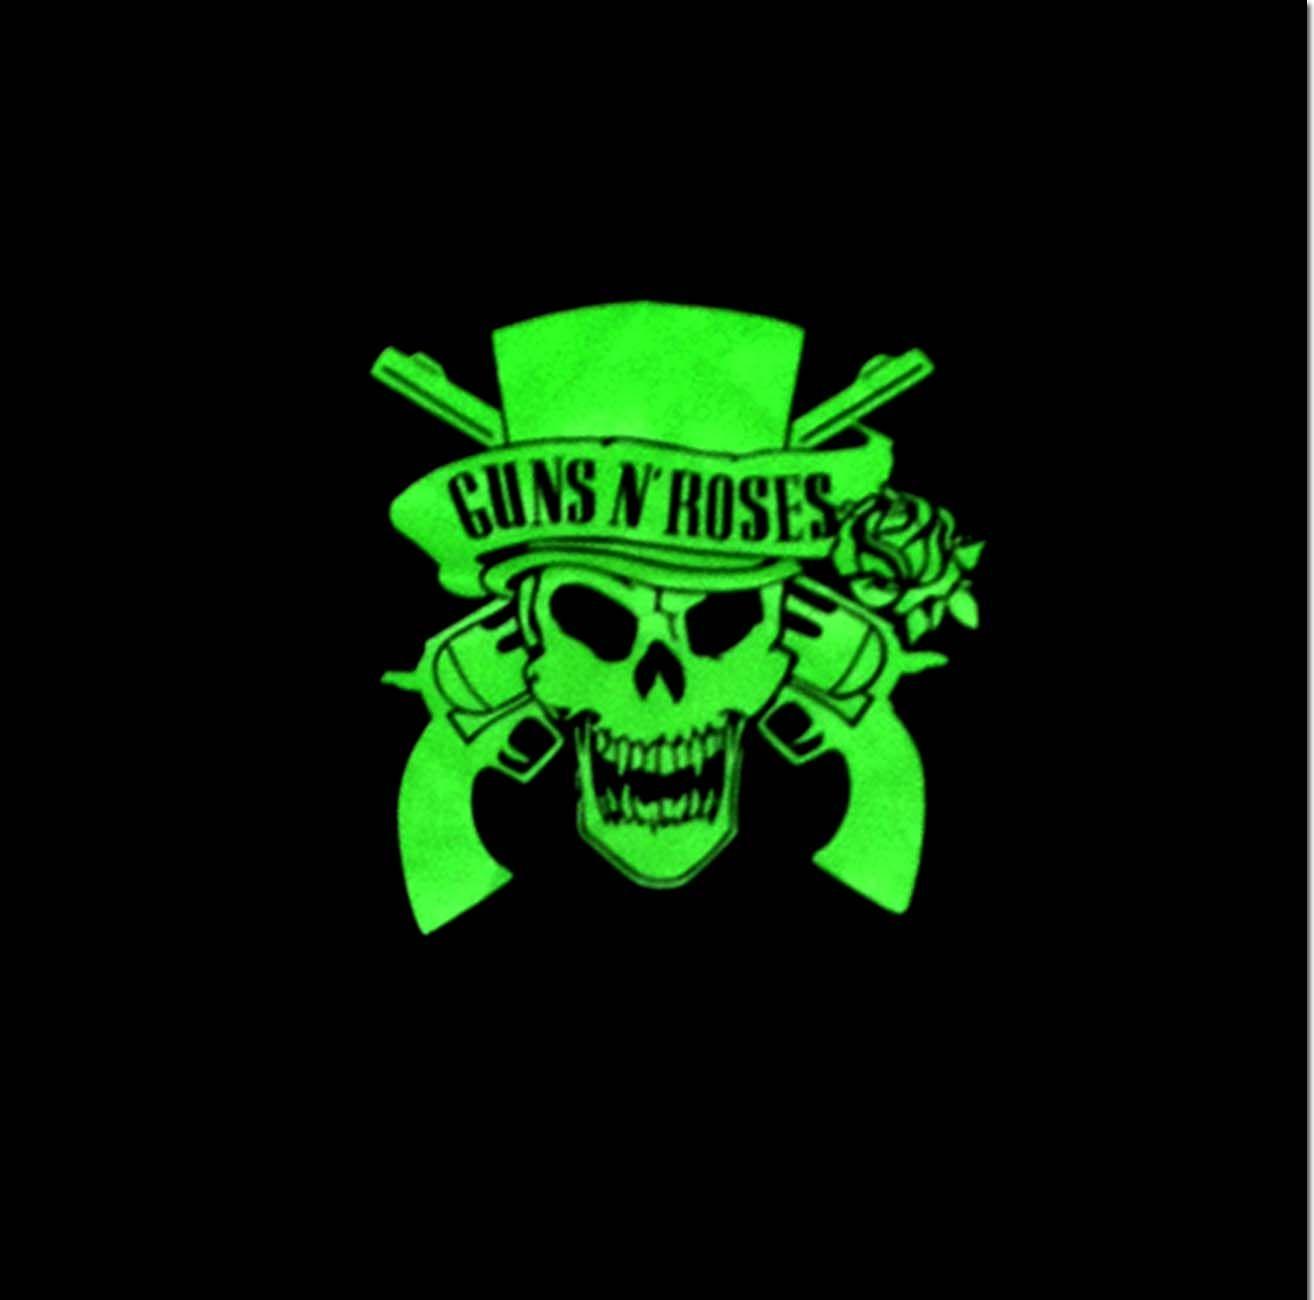 Camiseta Importada Guns 'N Roses - Brilha no Escuro!